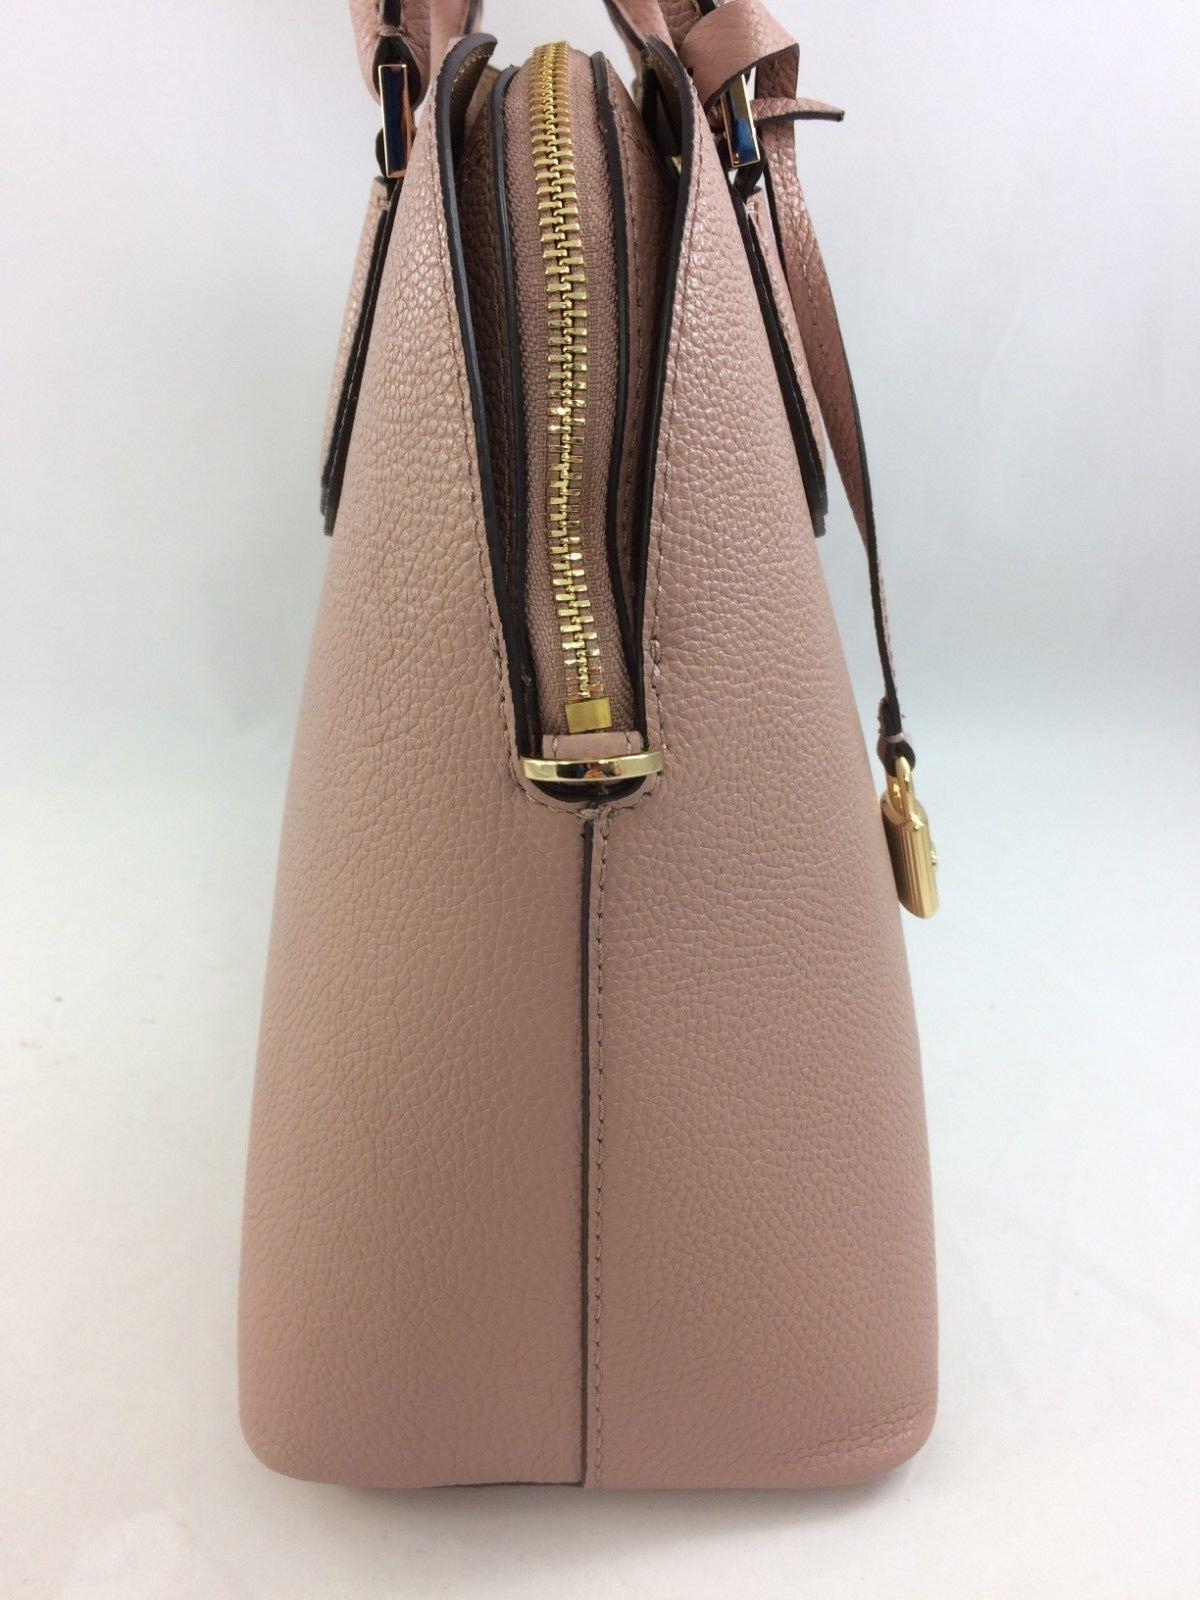 New Authentic Michael Adele Large Dome Satchel Handbag Purse